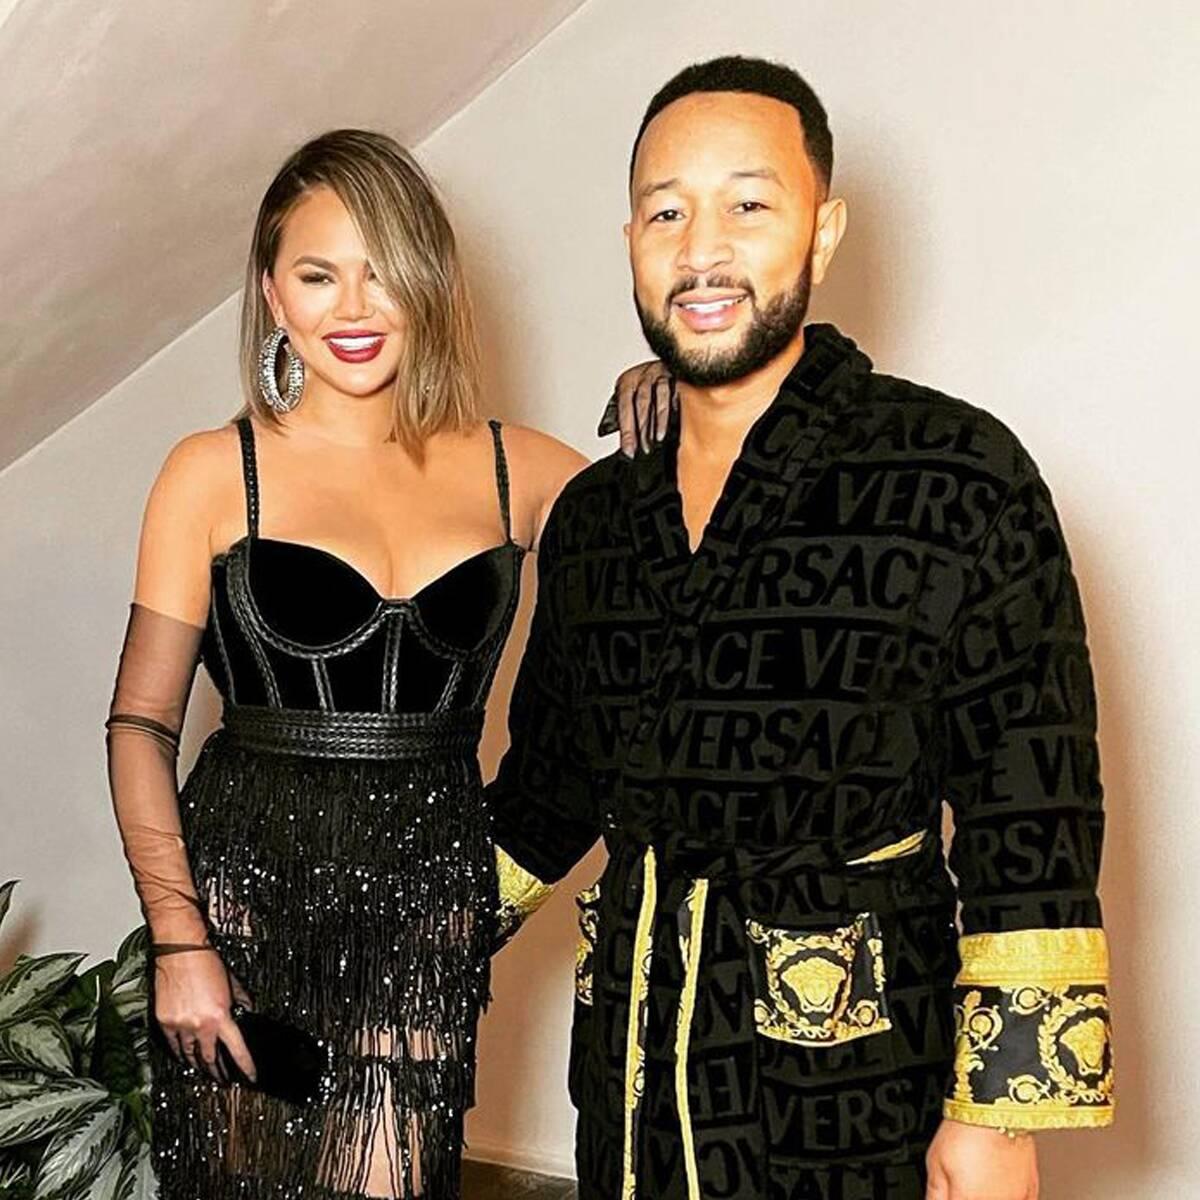 Chrissy Teigen Upstages John Legend's Grammys Robe With Her Raciest Look Yet